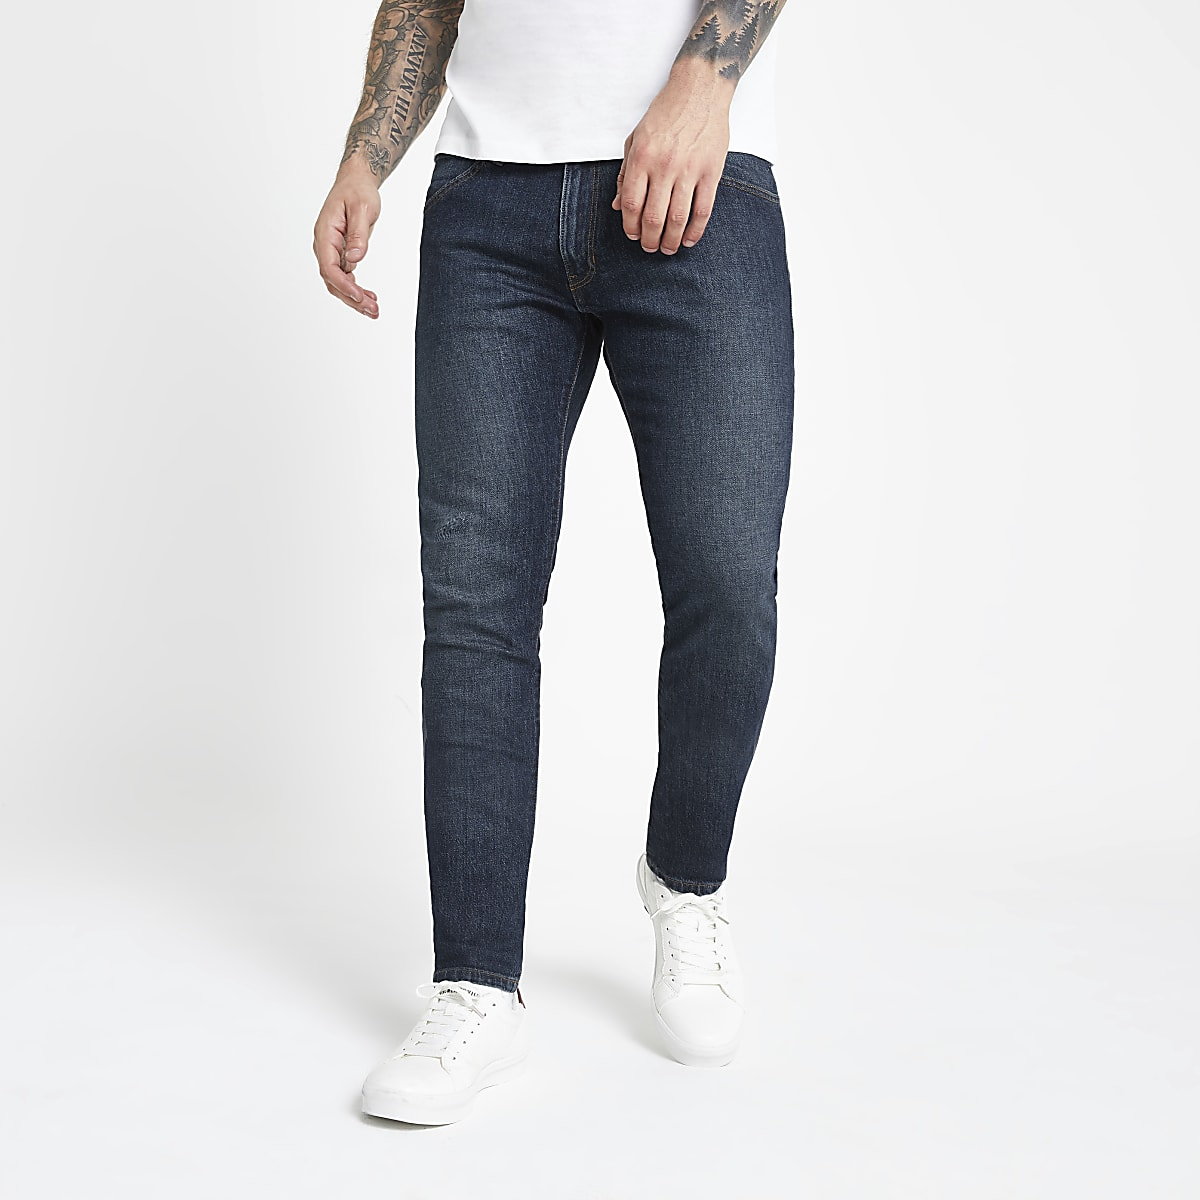 Wangler dark blue skinny fit jeans